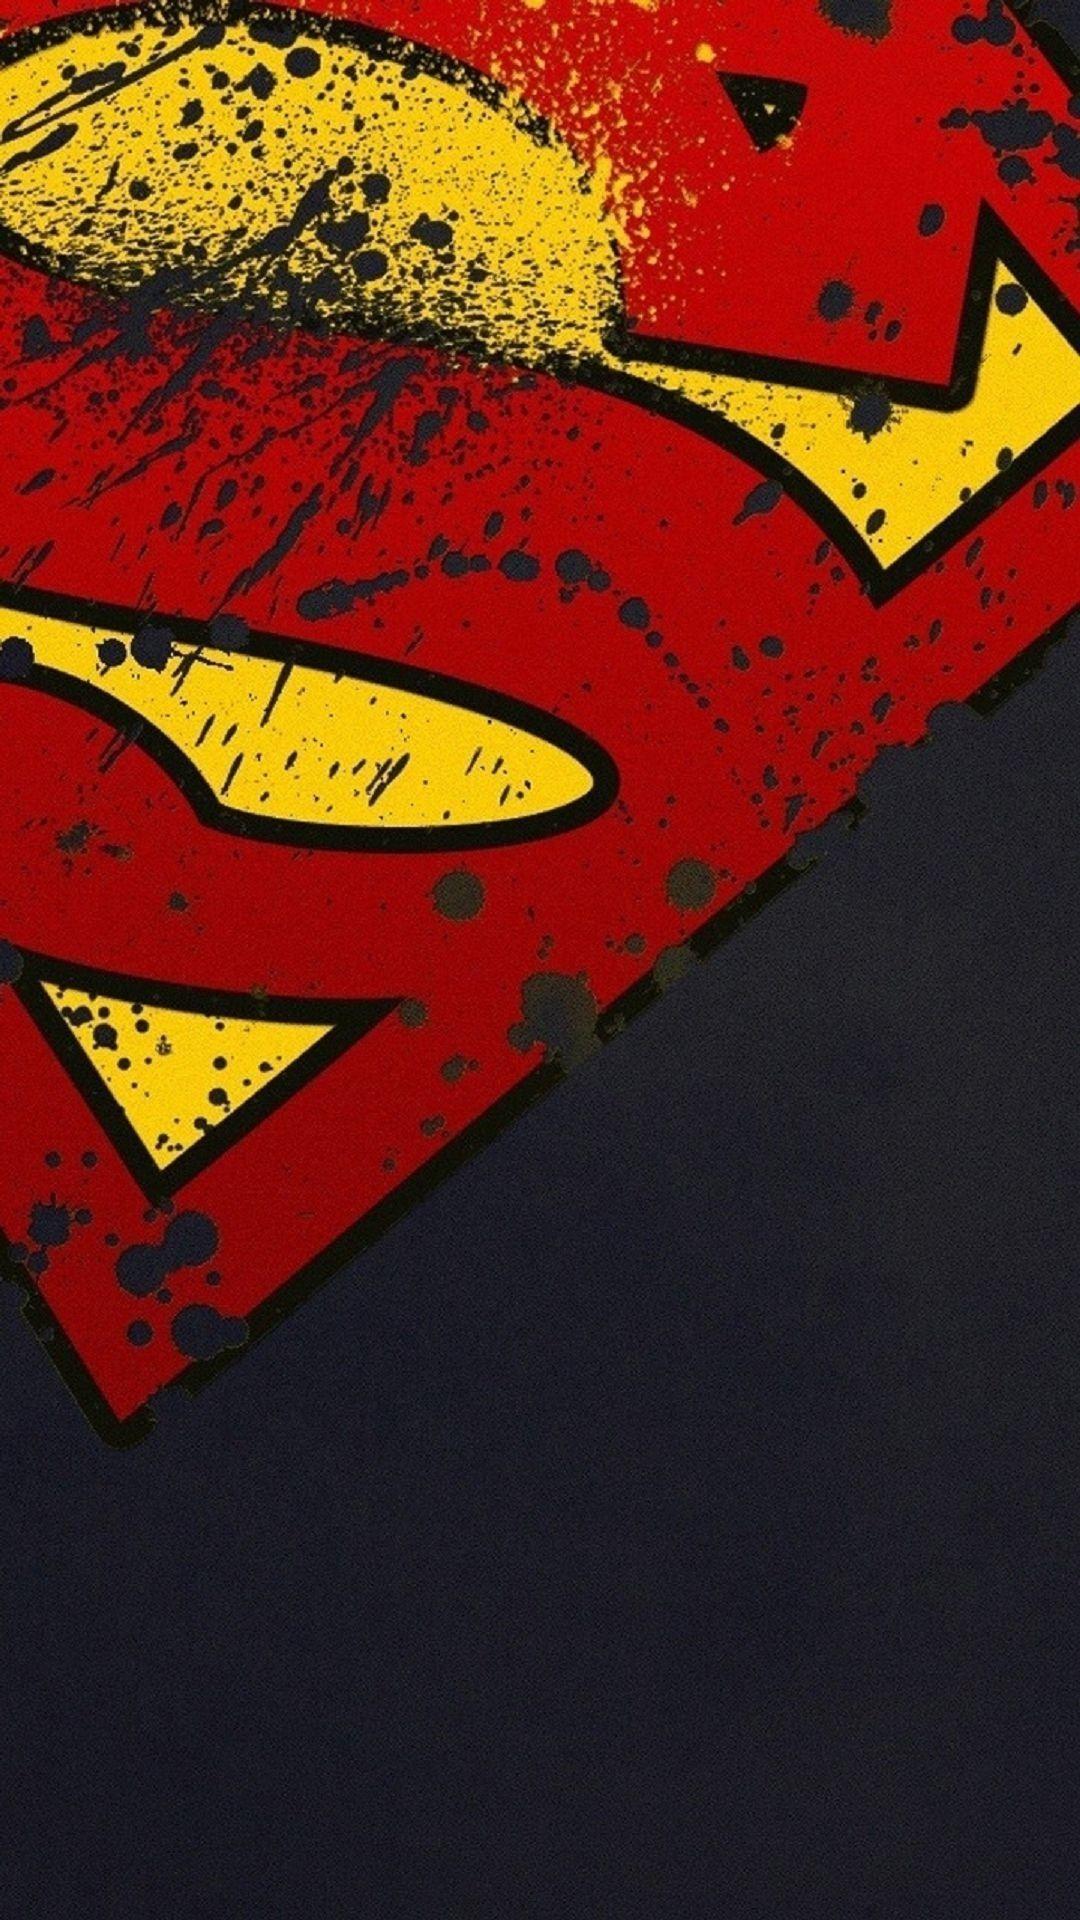 Superman Iphone Wallpapers Wallpaper Cave